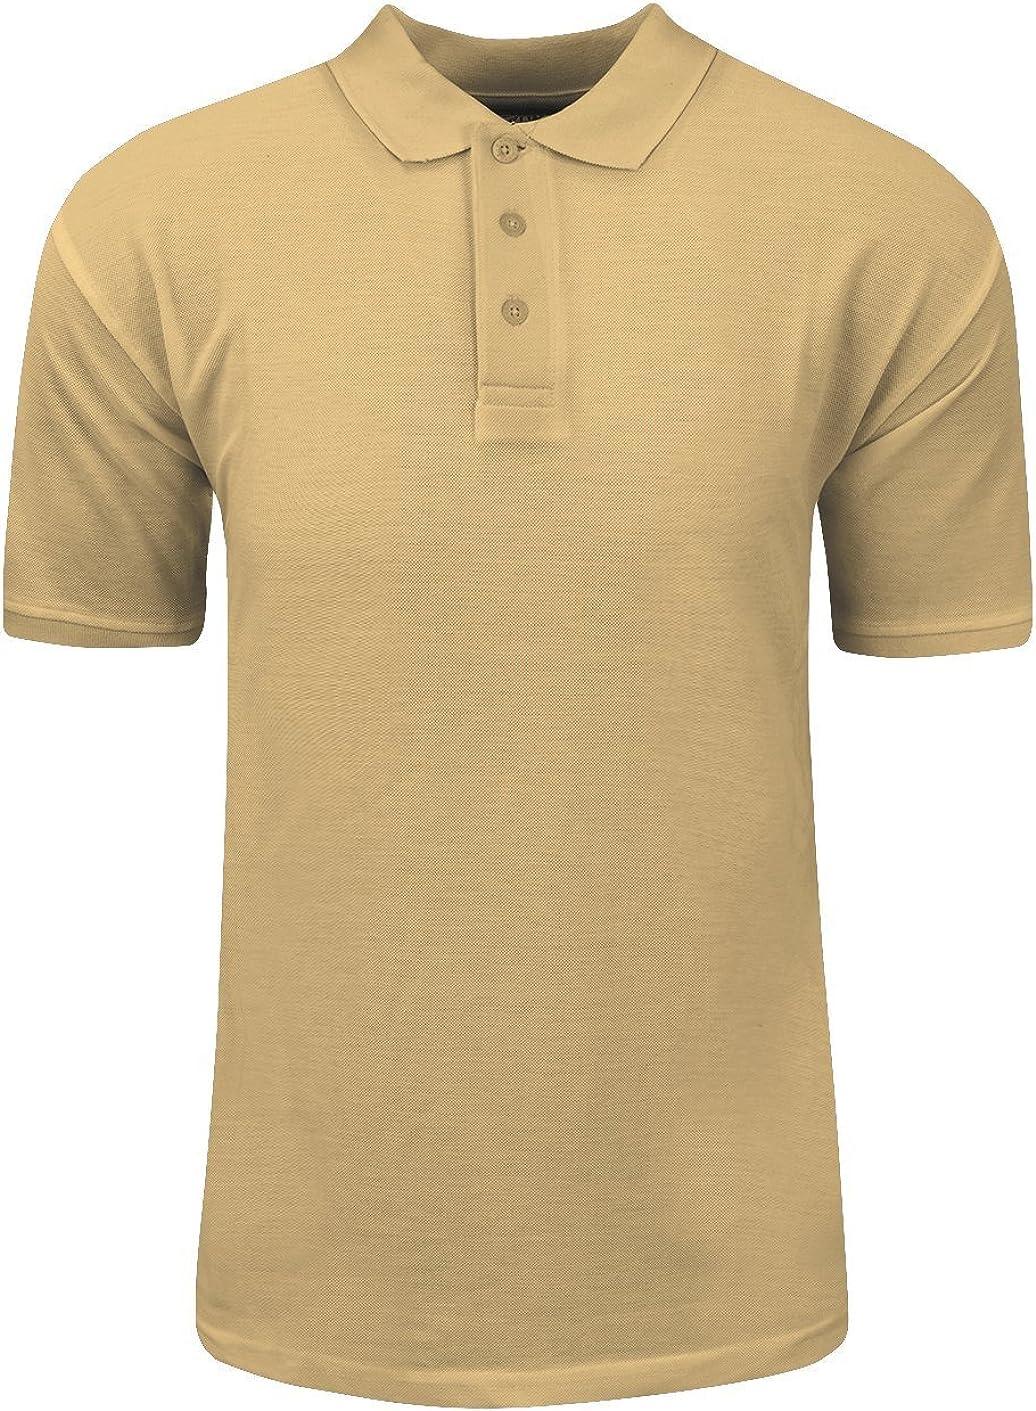 Shaka Wear Men's Polo Shirt – Classic Pique Short Sleeve Collared Solid Casual CVC Polyester Top Regular Big Size S~5XL